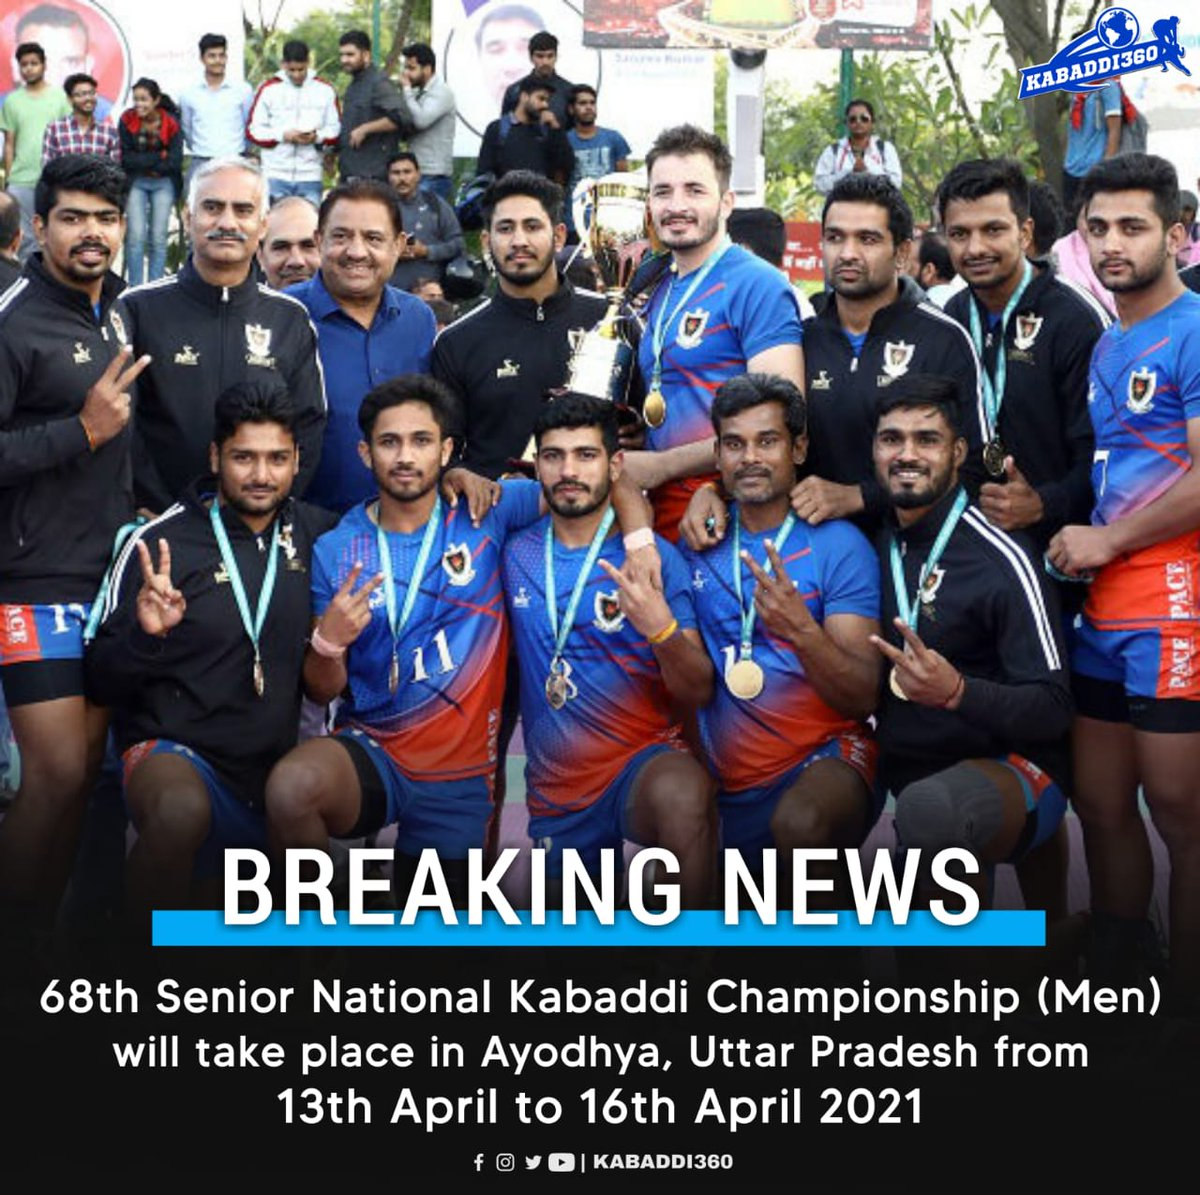 The dates & venue of the much-anticipated 68th Senior Nationals (Men) is finally here 🚨  #68thSeniorNationalKabaddiChampionship #Kabaddi360 #BreakingNews